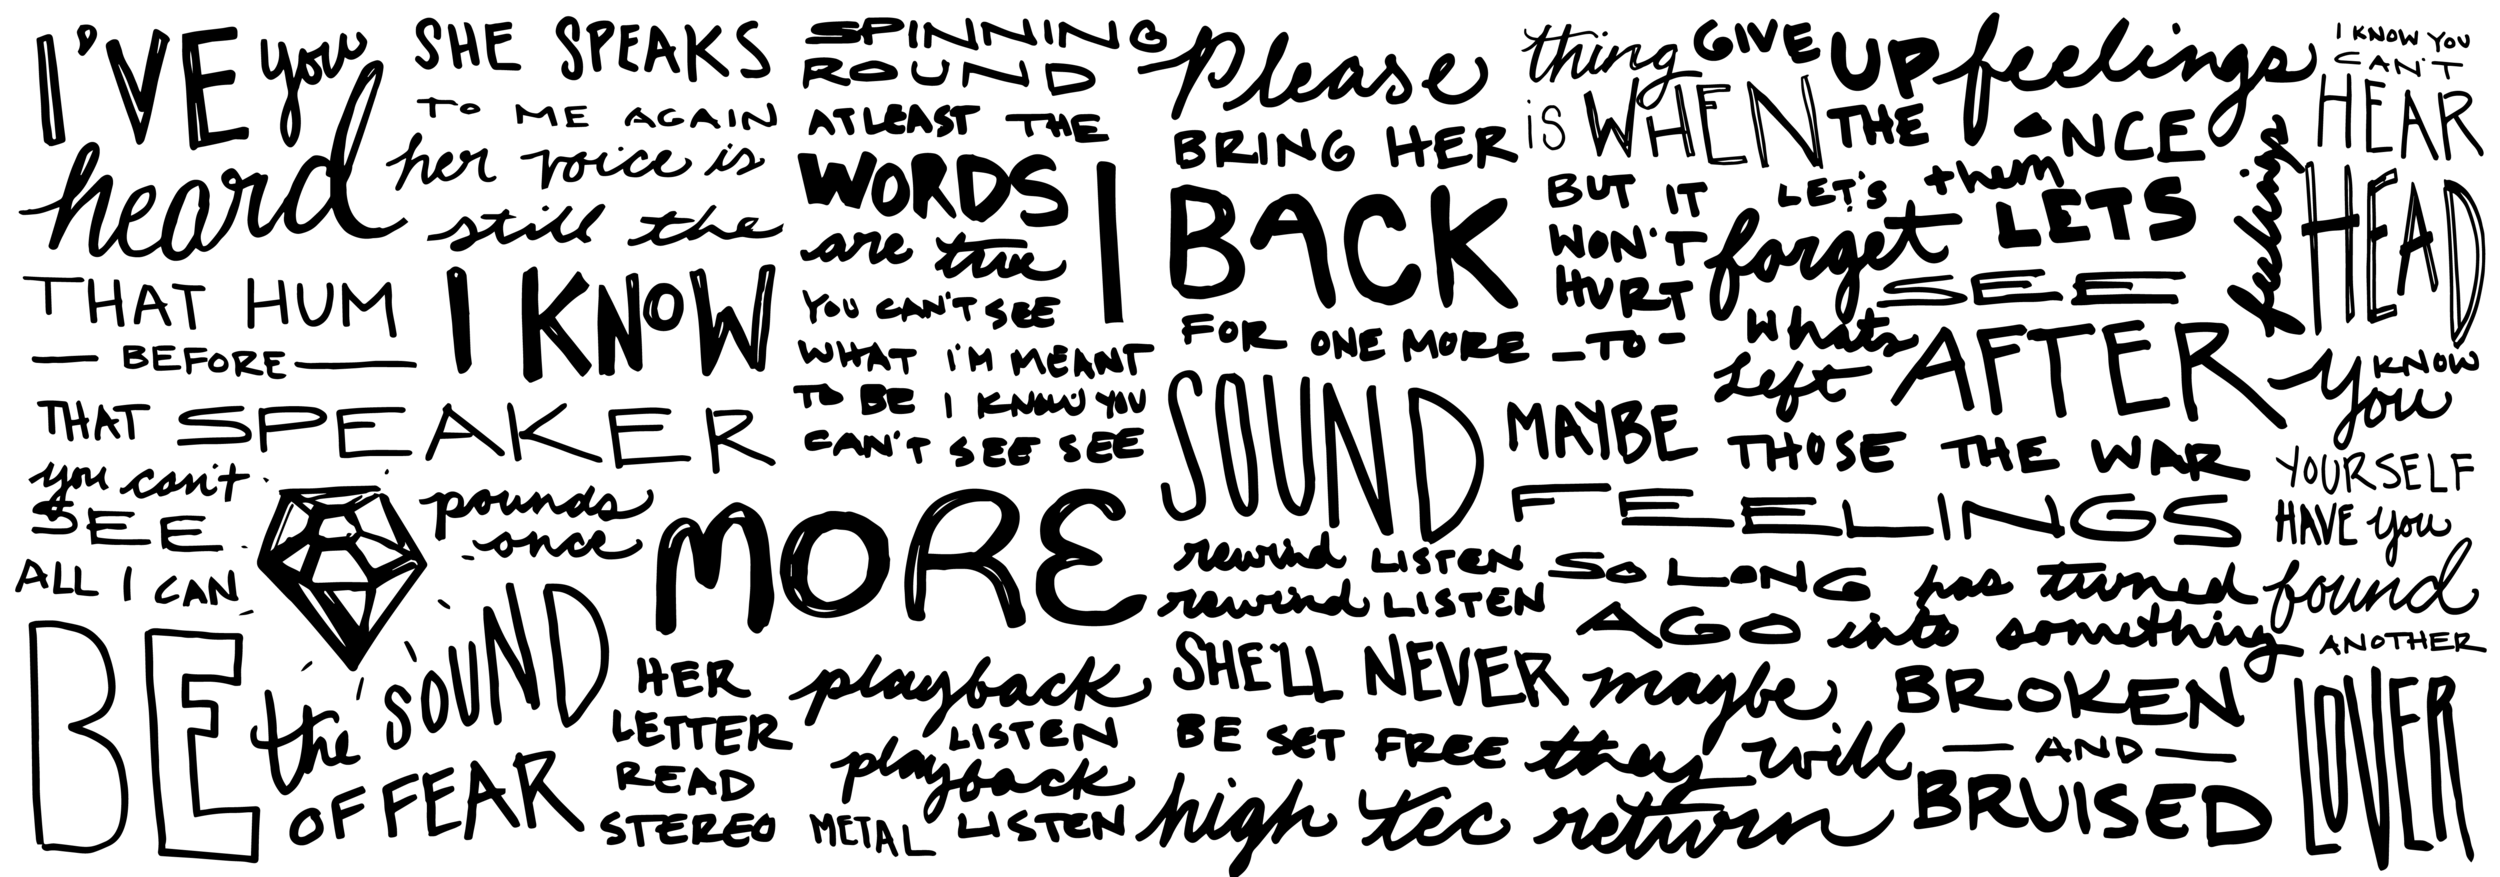 LSB_(2)BayWalls_42.75x15_-02.png